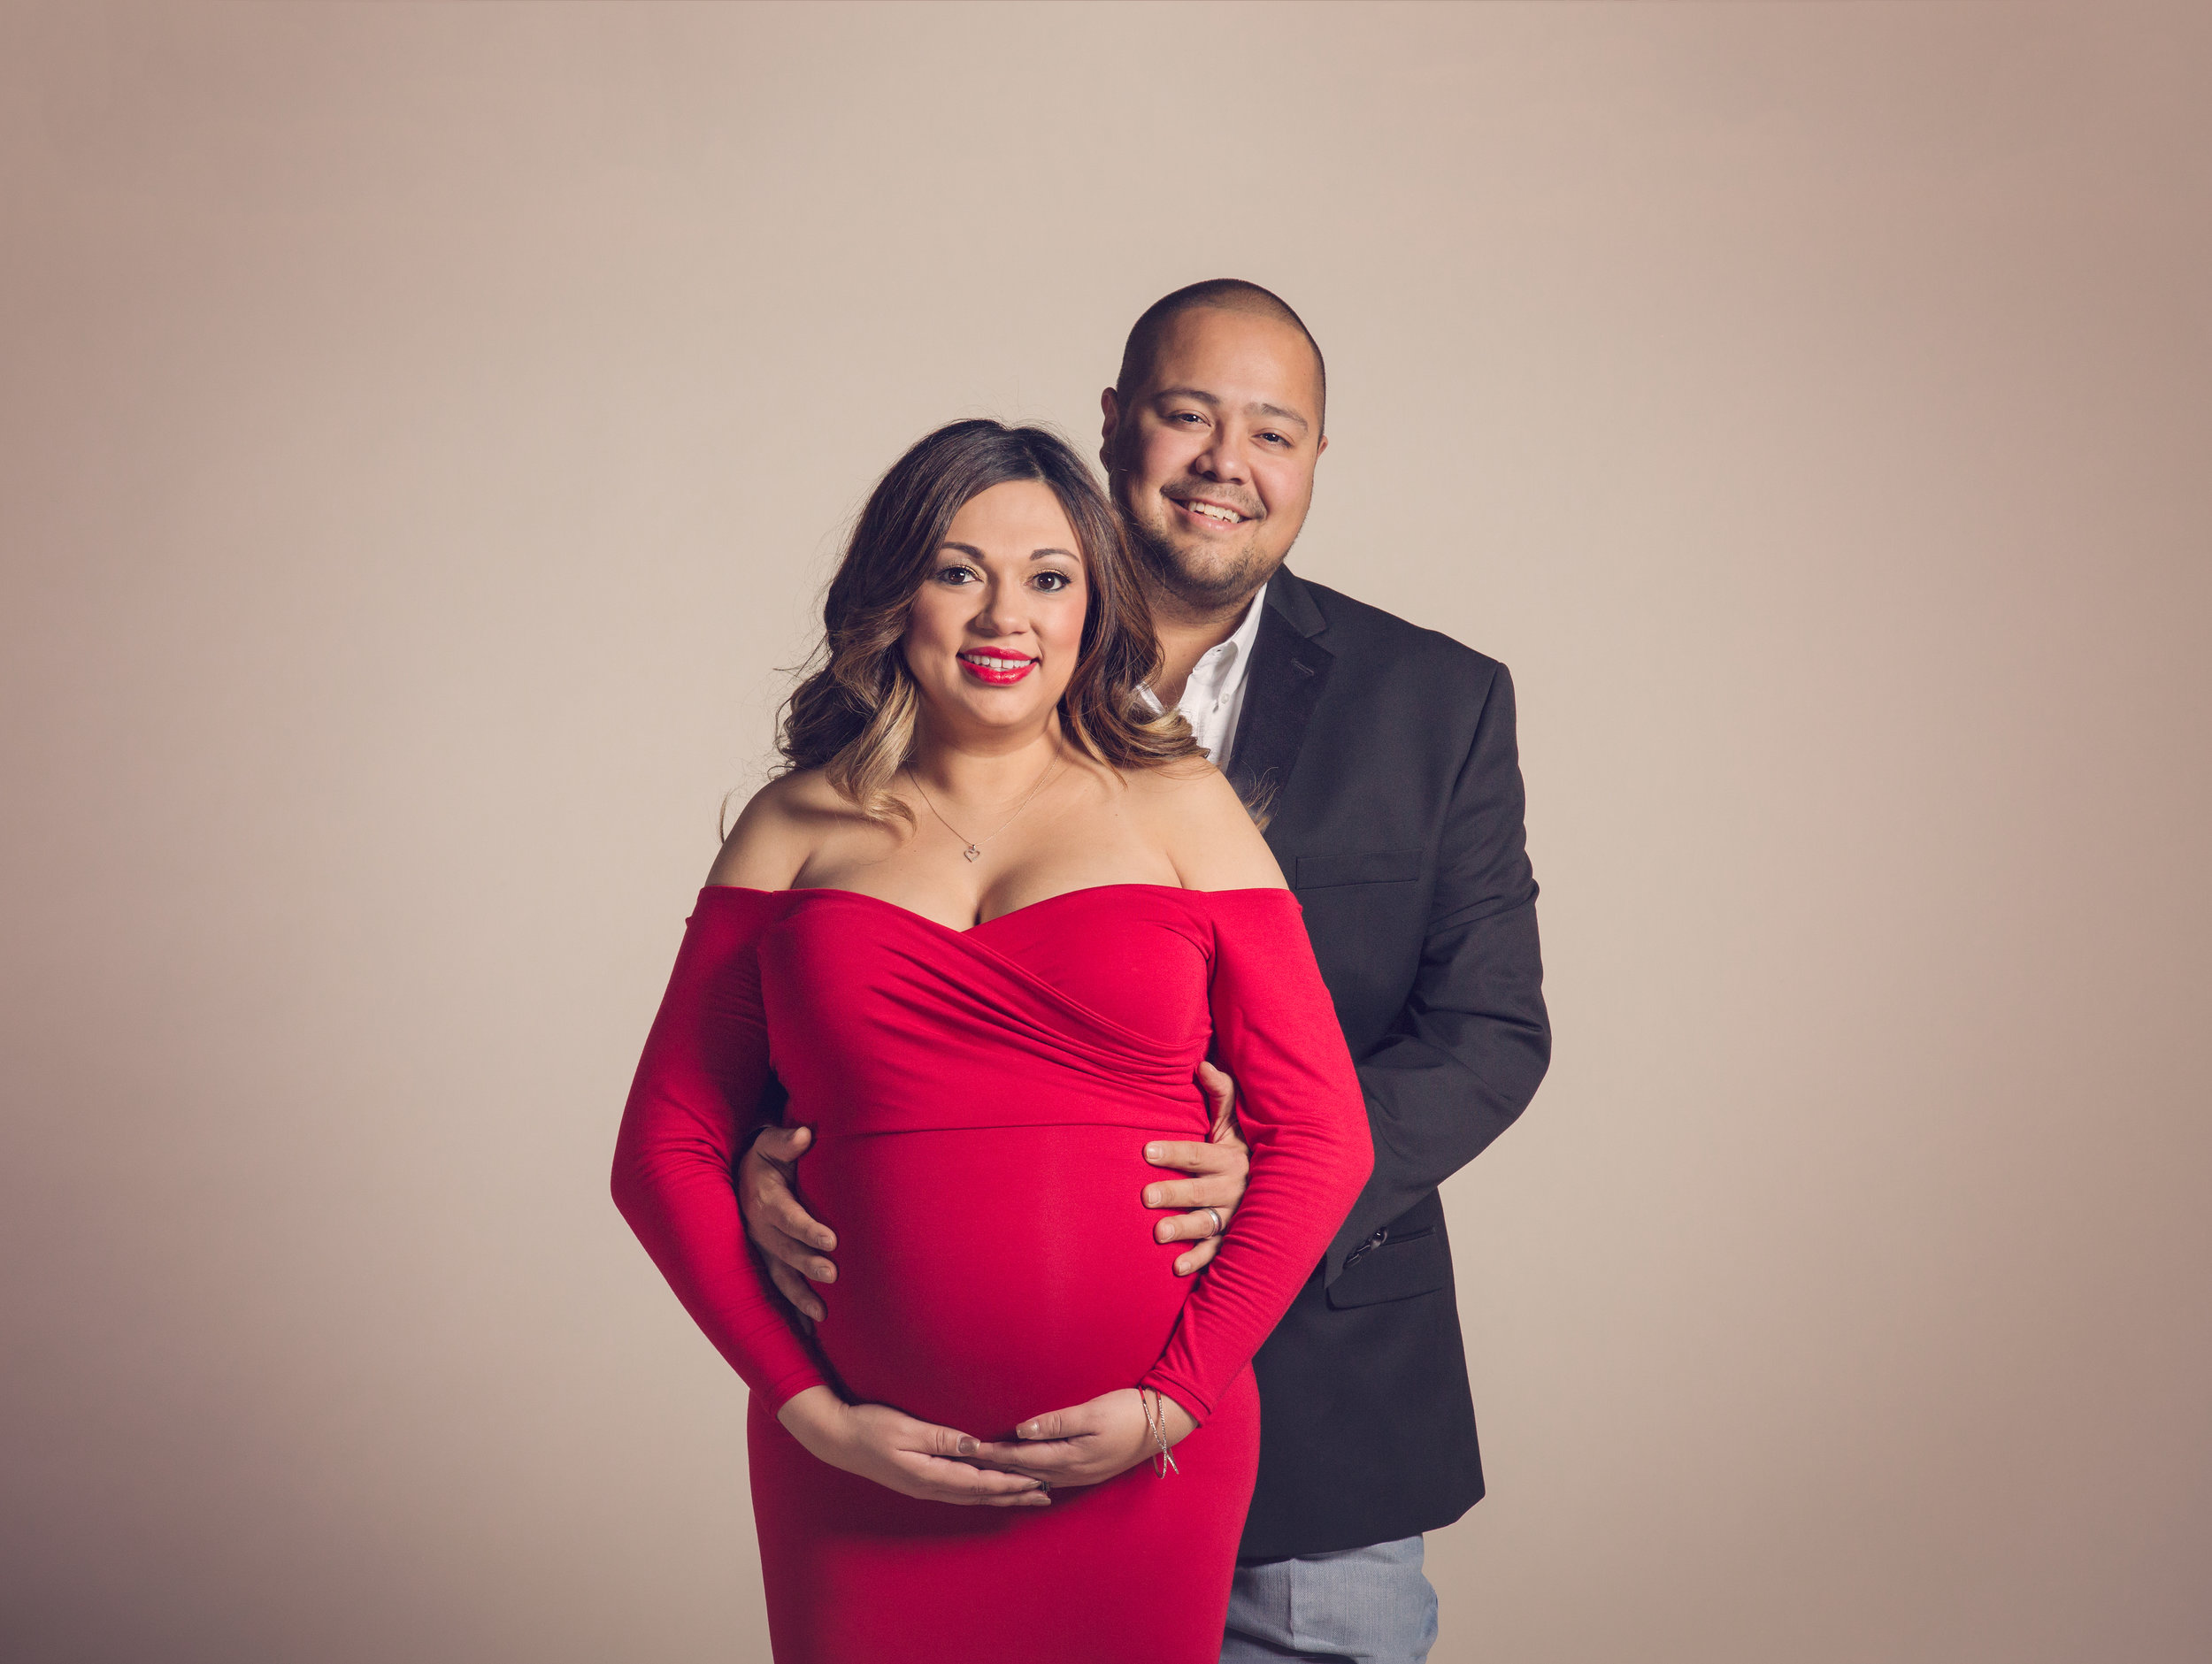 melissa martinez maternity lubbock texas